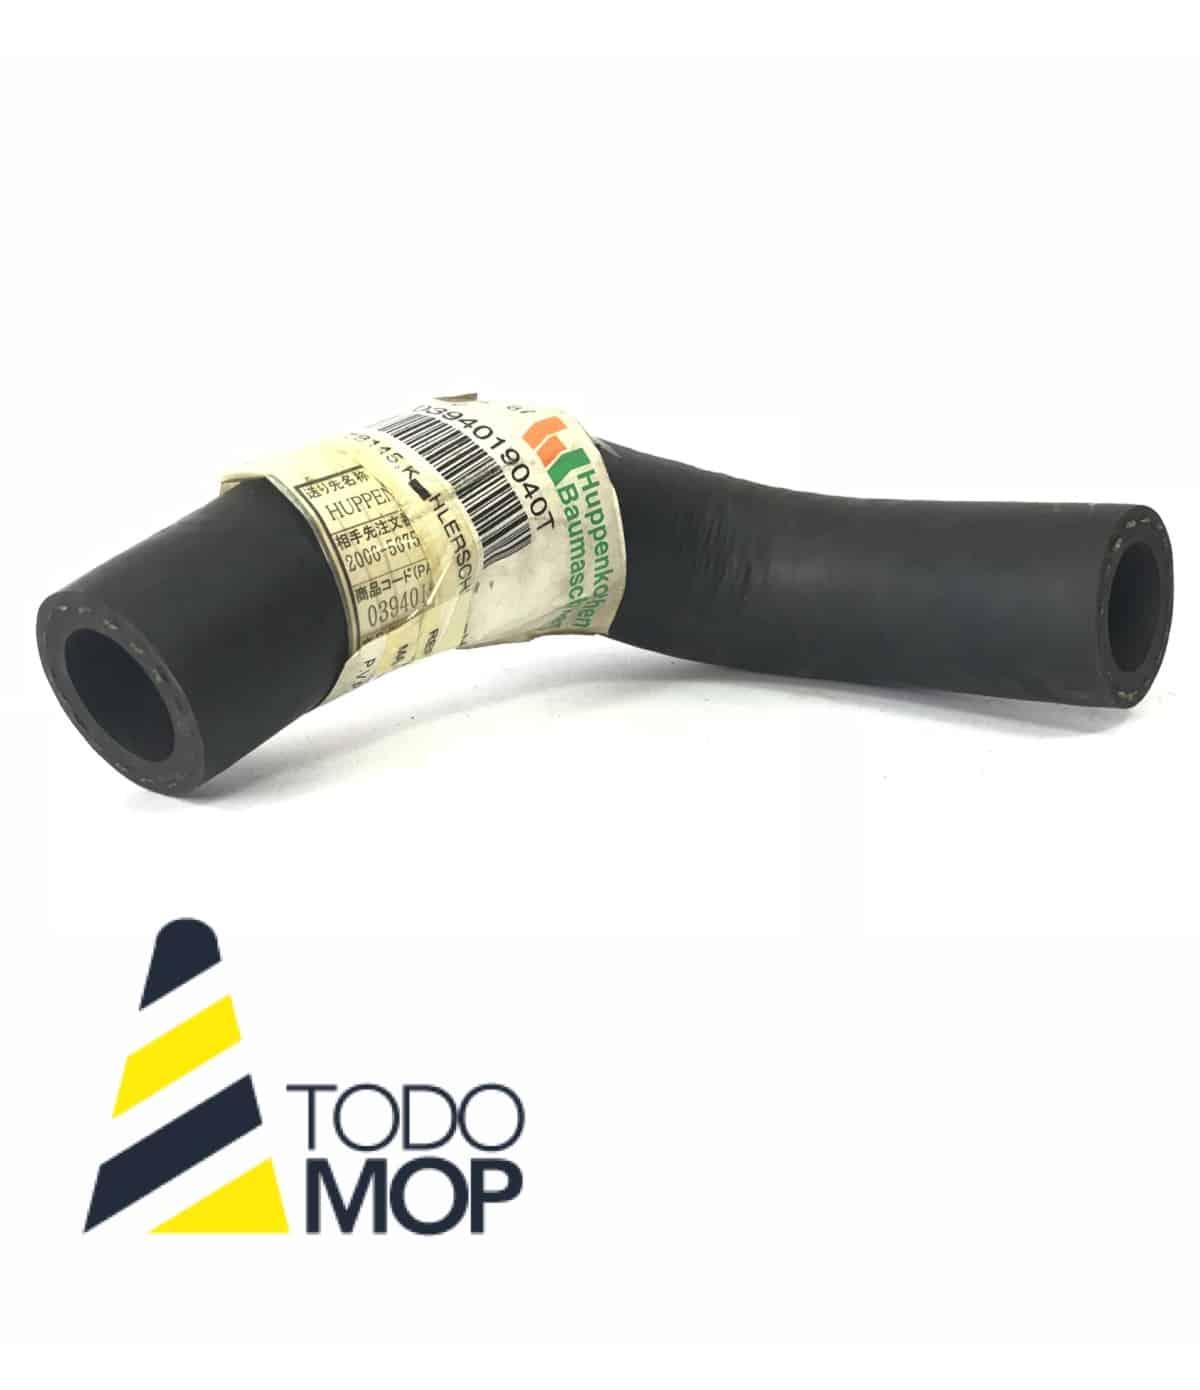 MANGUITO BOMBA RADIADOR TAKEUCHI TB145